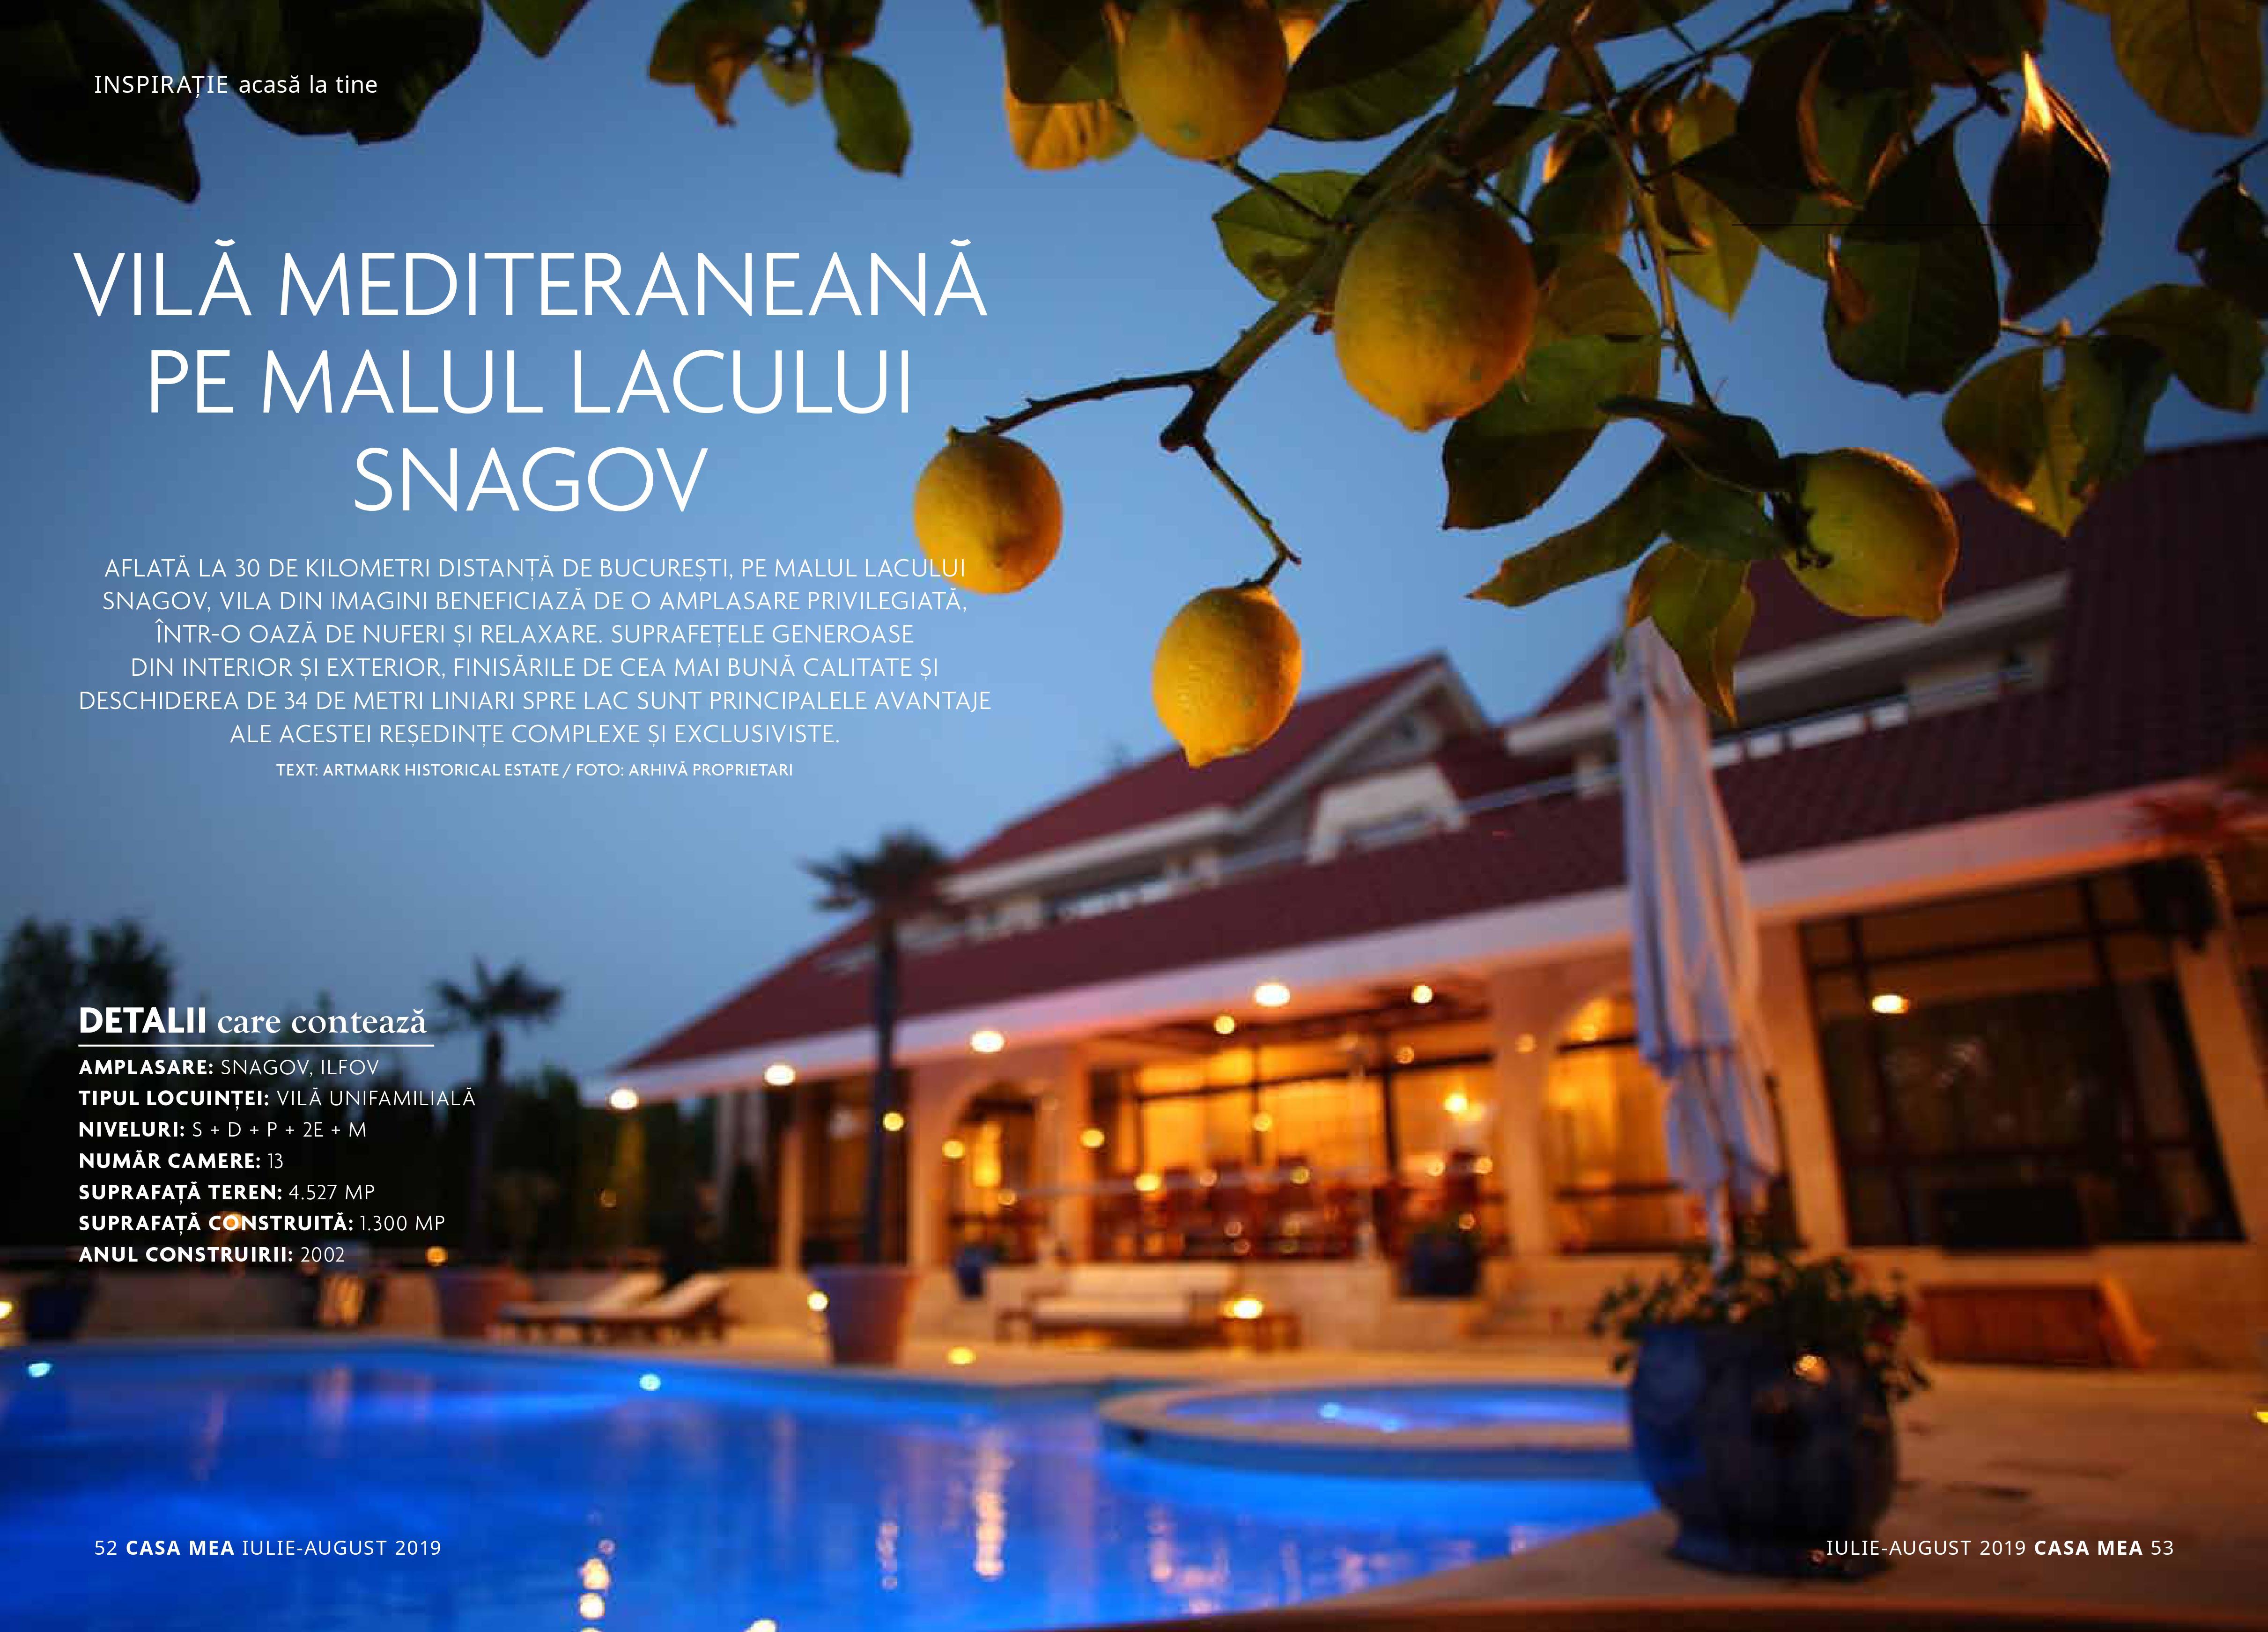 https://www.sothebysrealty.ro/wp/wp-content/uploads/2019/08/Vila-mediteraneană-de-pe-malul-Lacului-Snagov-1.jpg